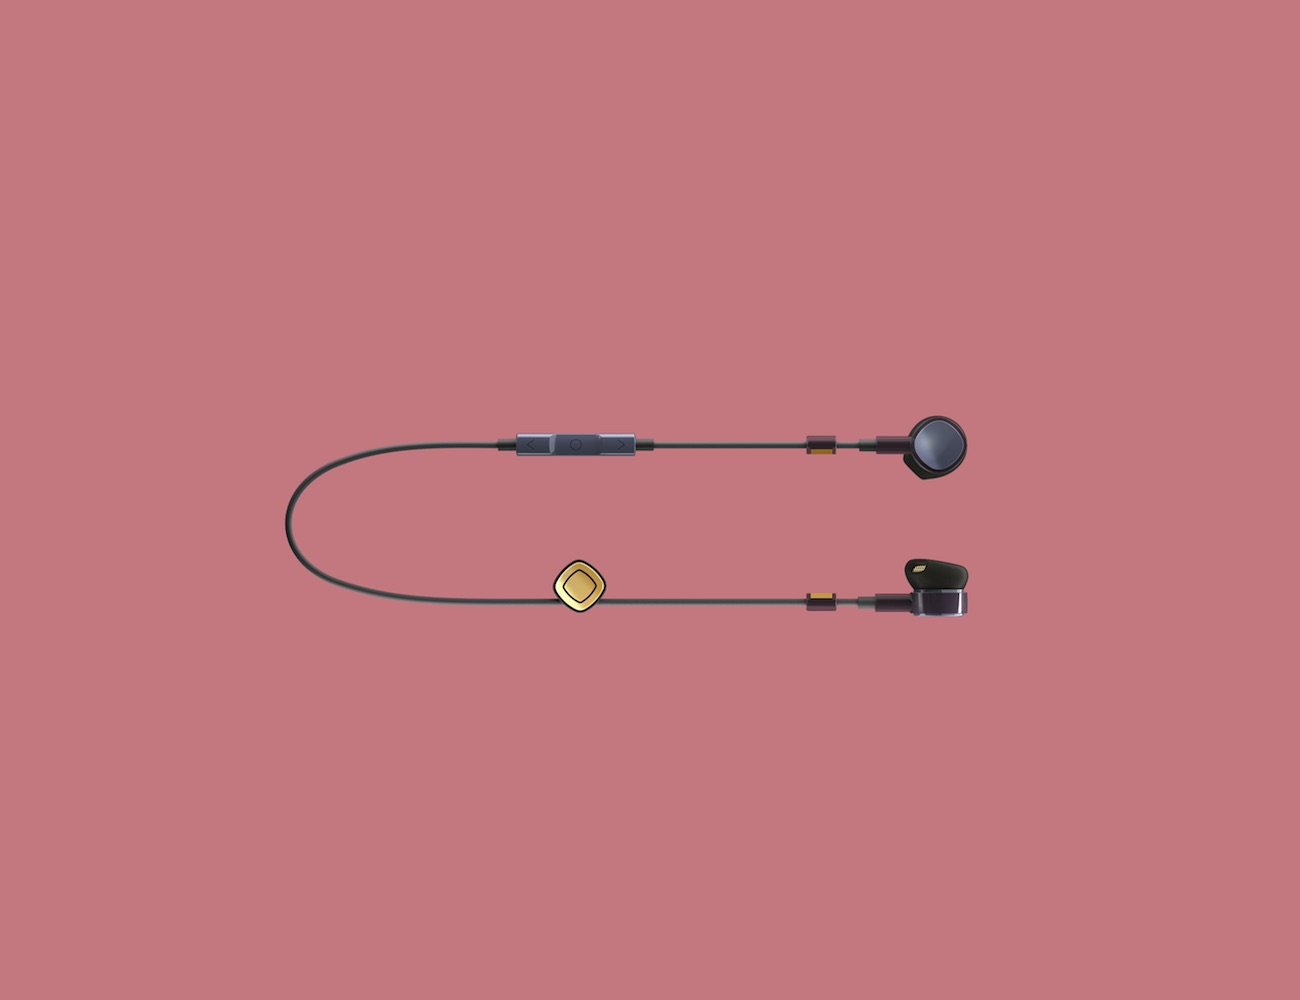 PUGZ – The World's Smallest Earphones